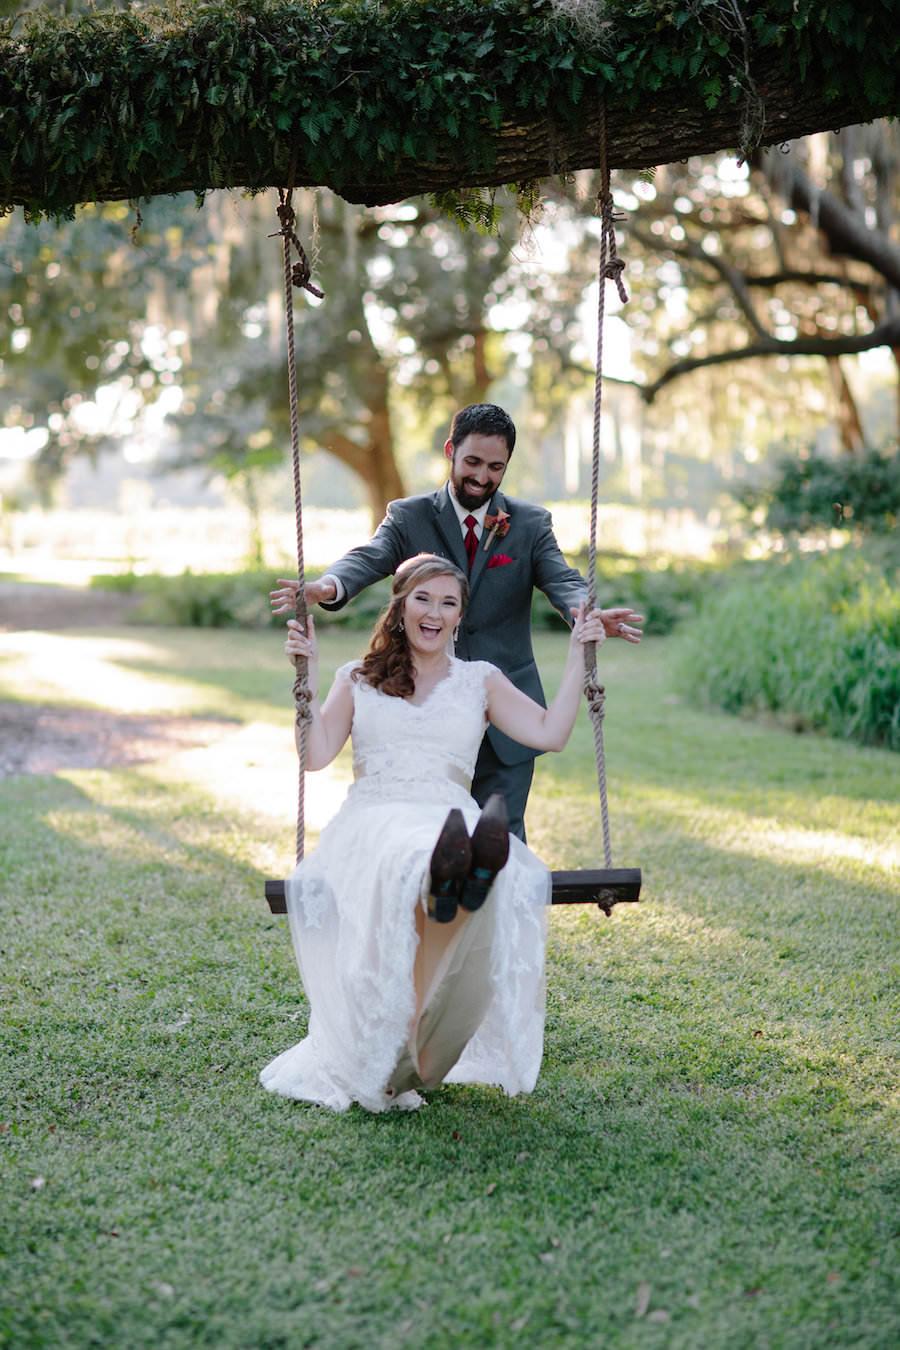 Outdoor, Dover Bride and Groom Wedding Portrait on Tree Swing